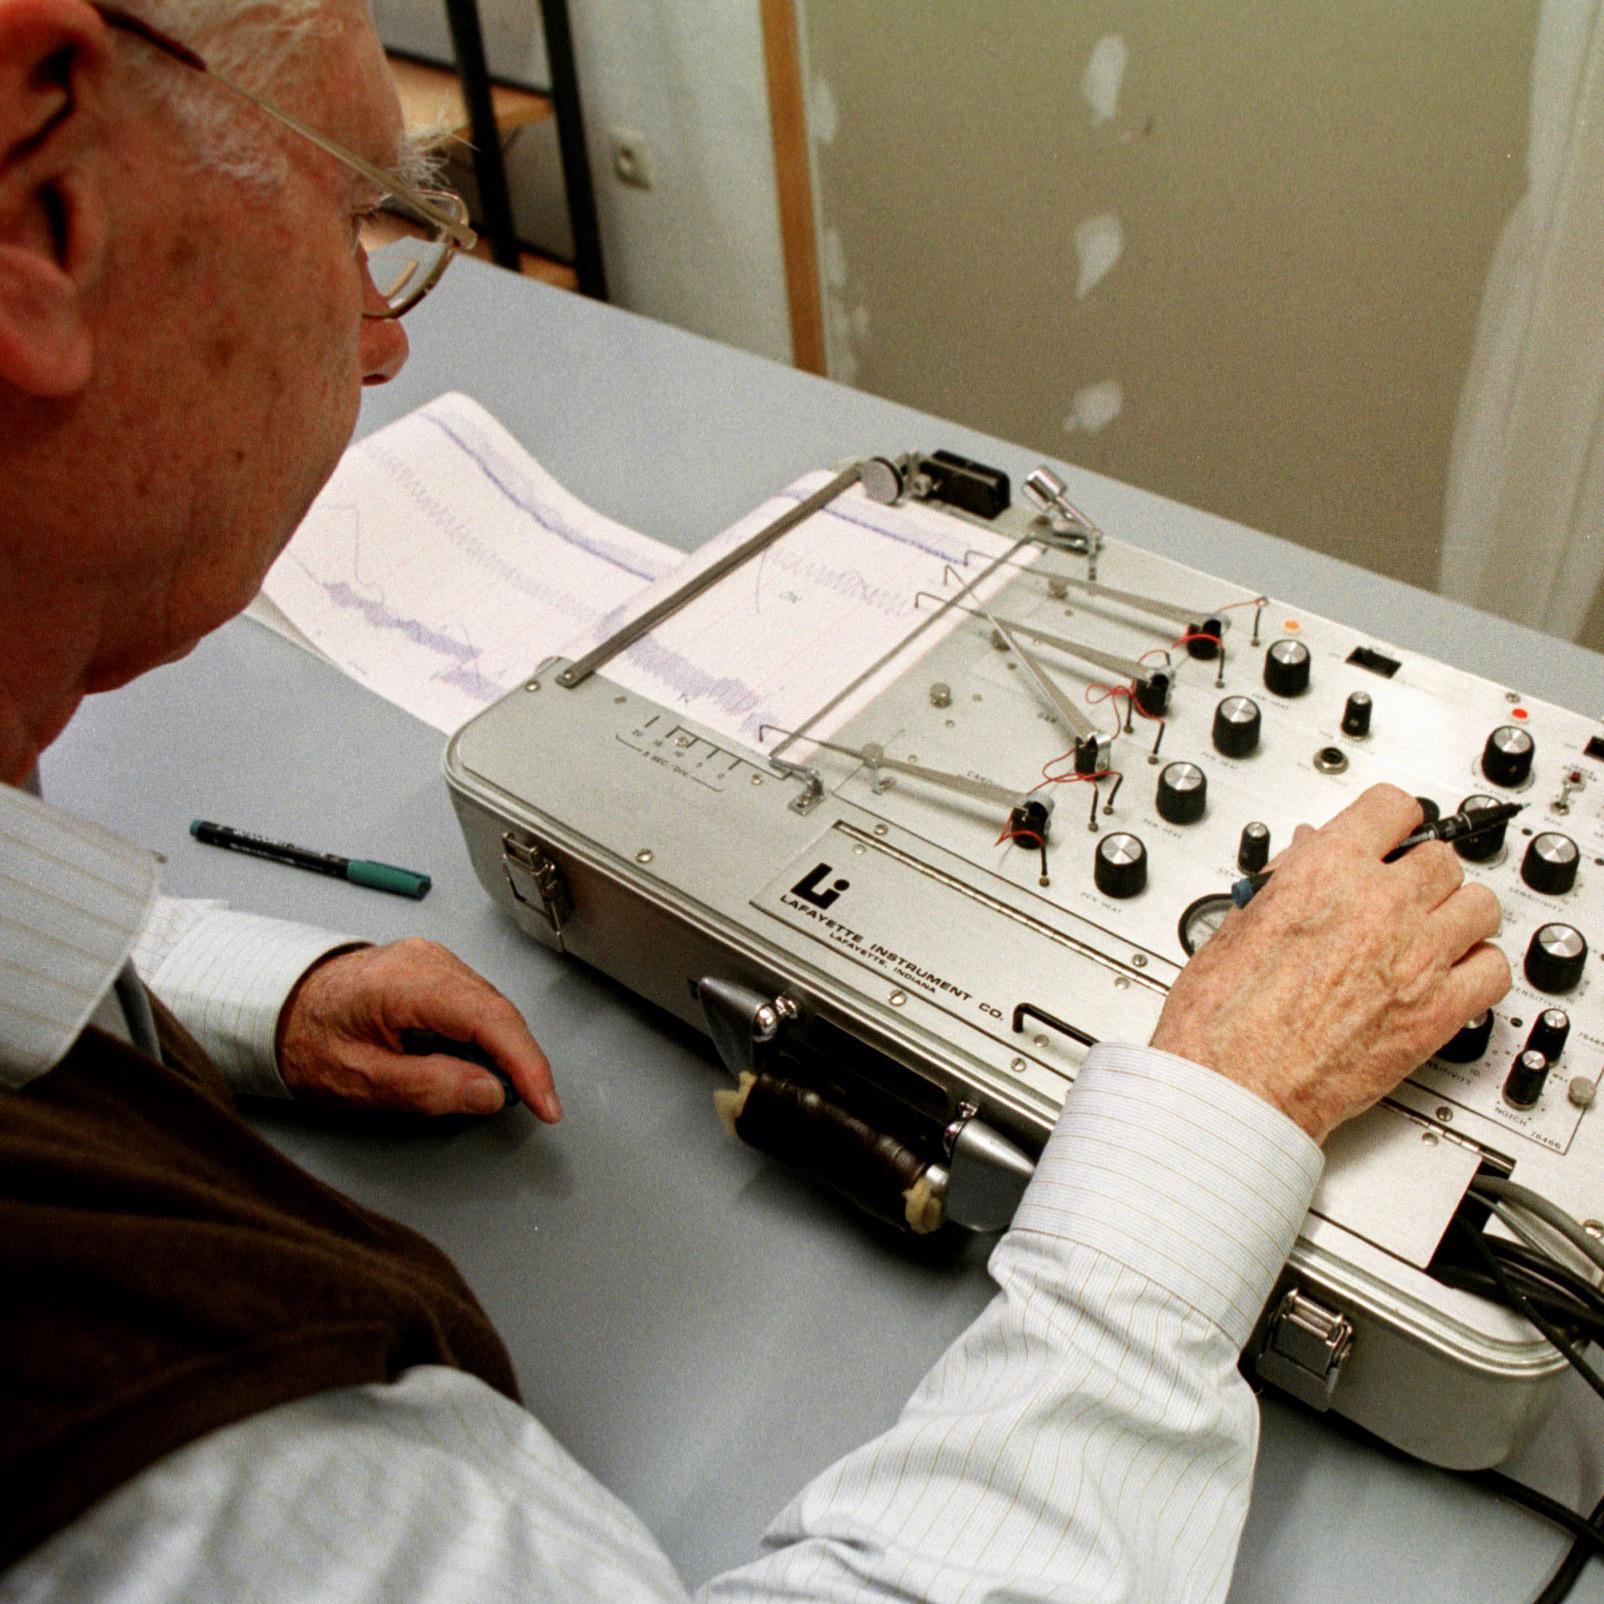 A polygraph machine.